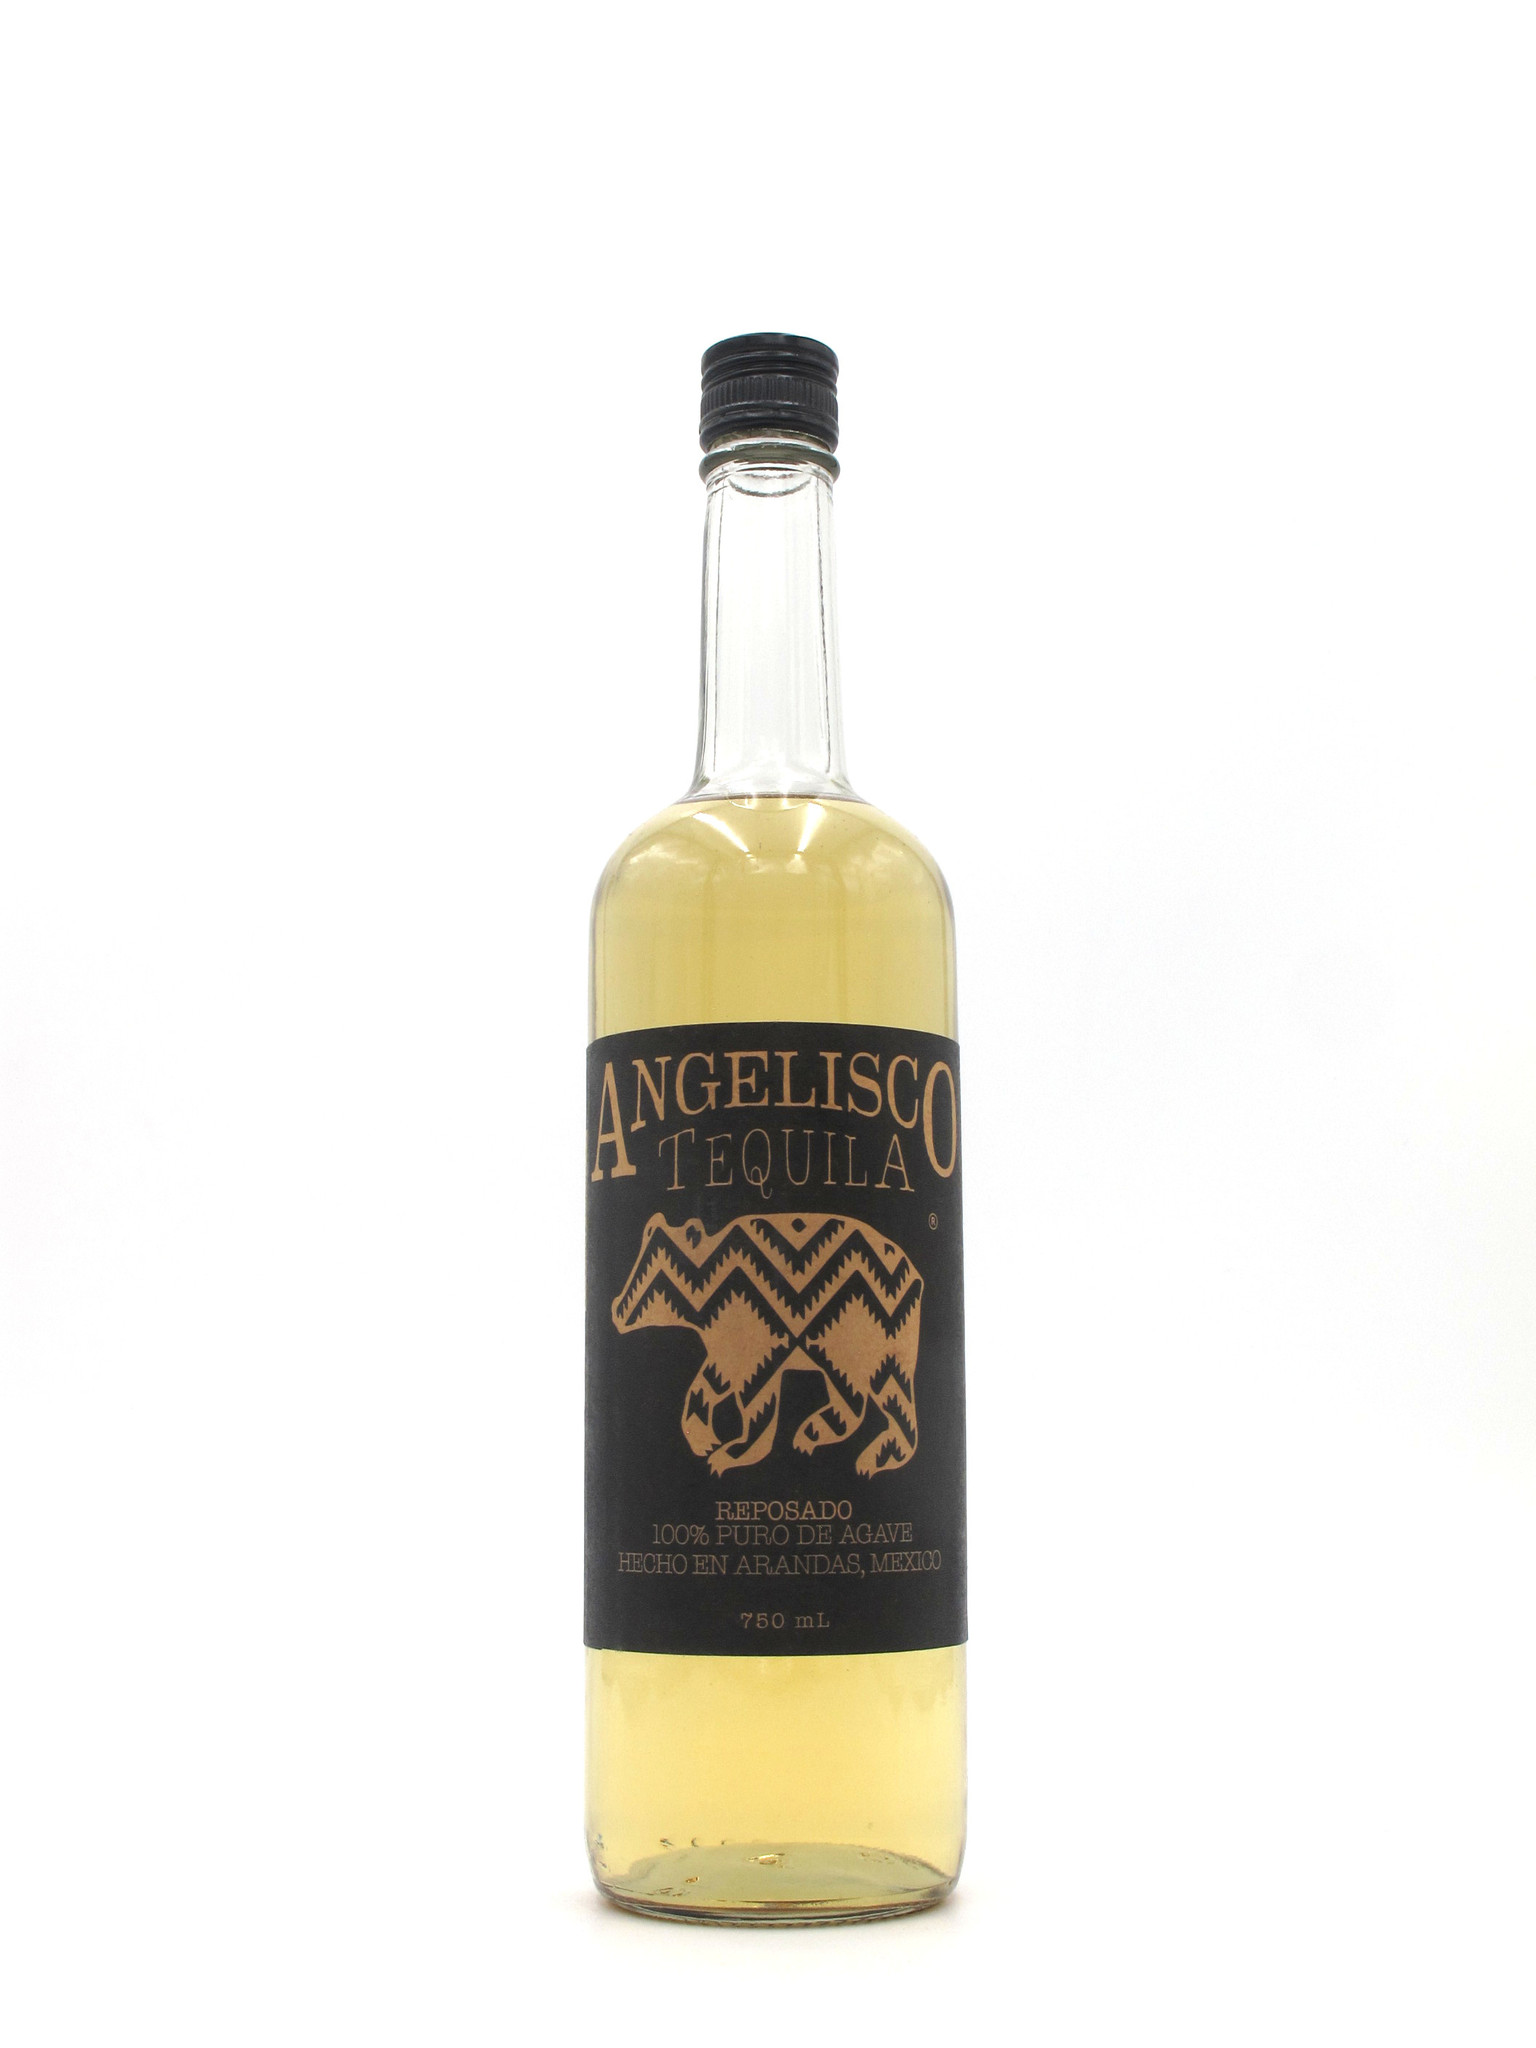 Angelisco Tequila Angelisco Tequila Reposado 750mL